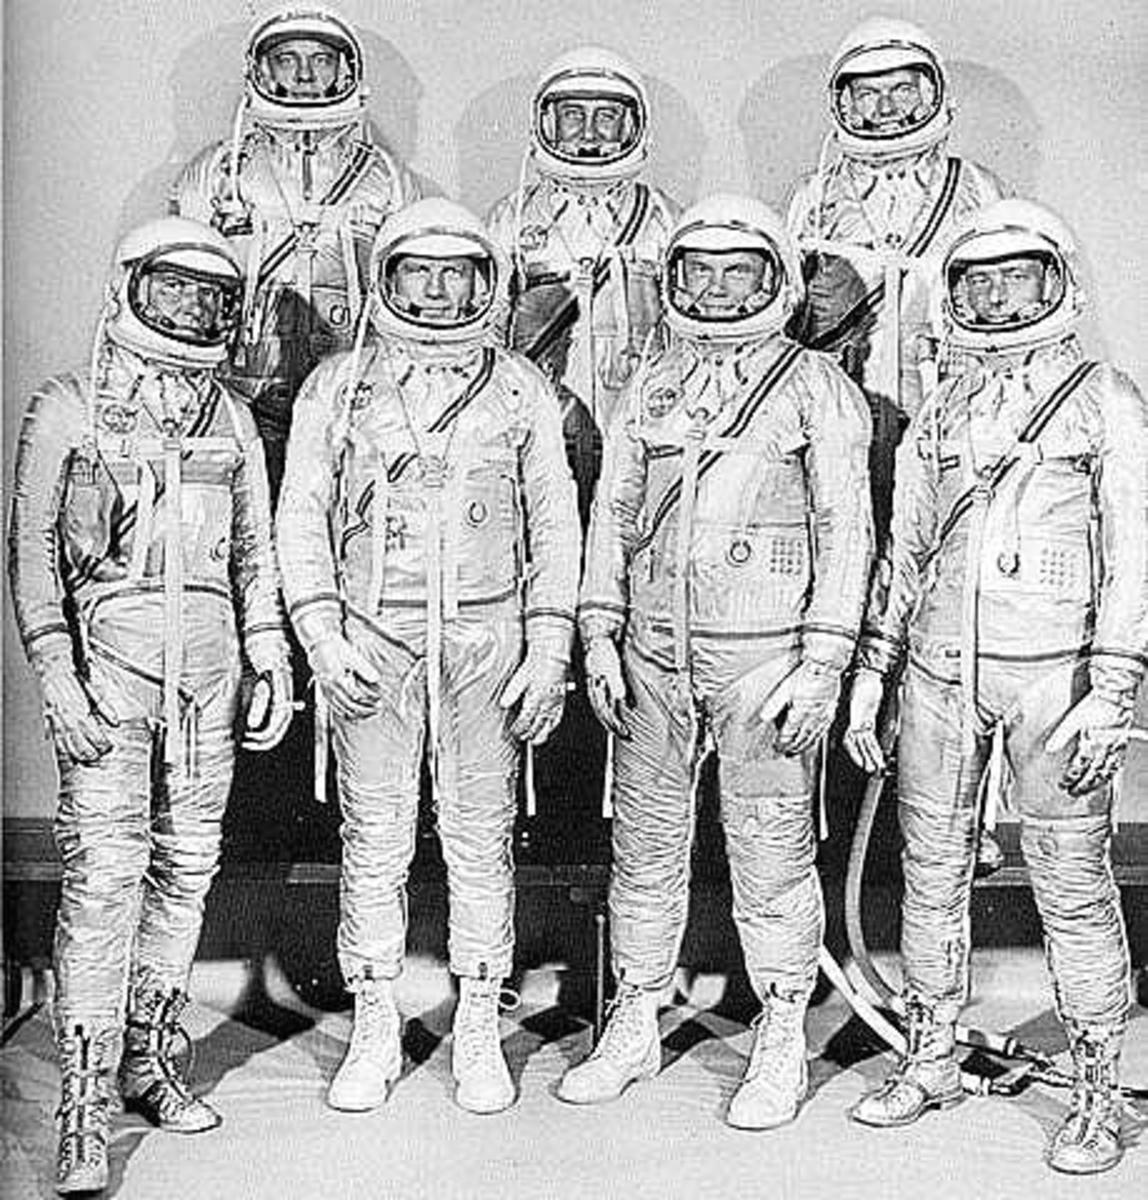 Mercury 1 Team